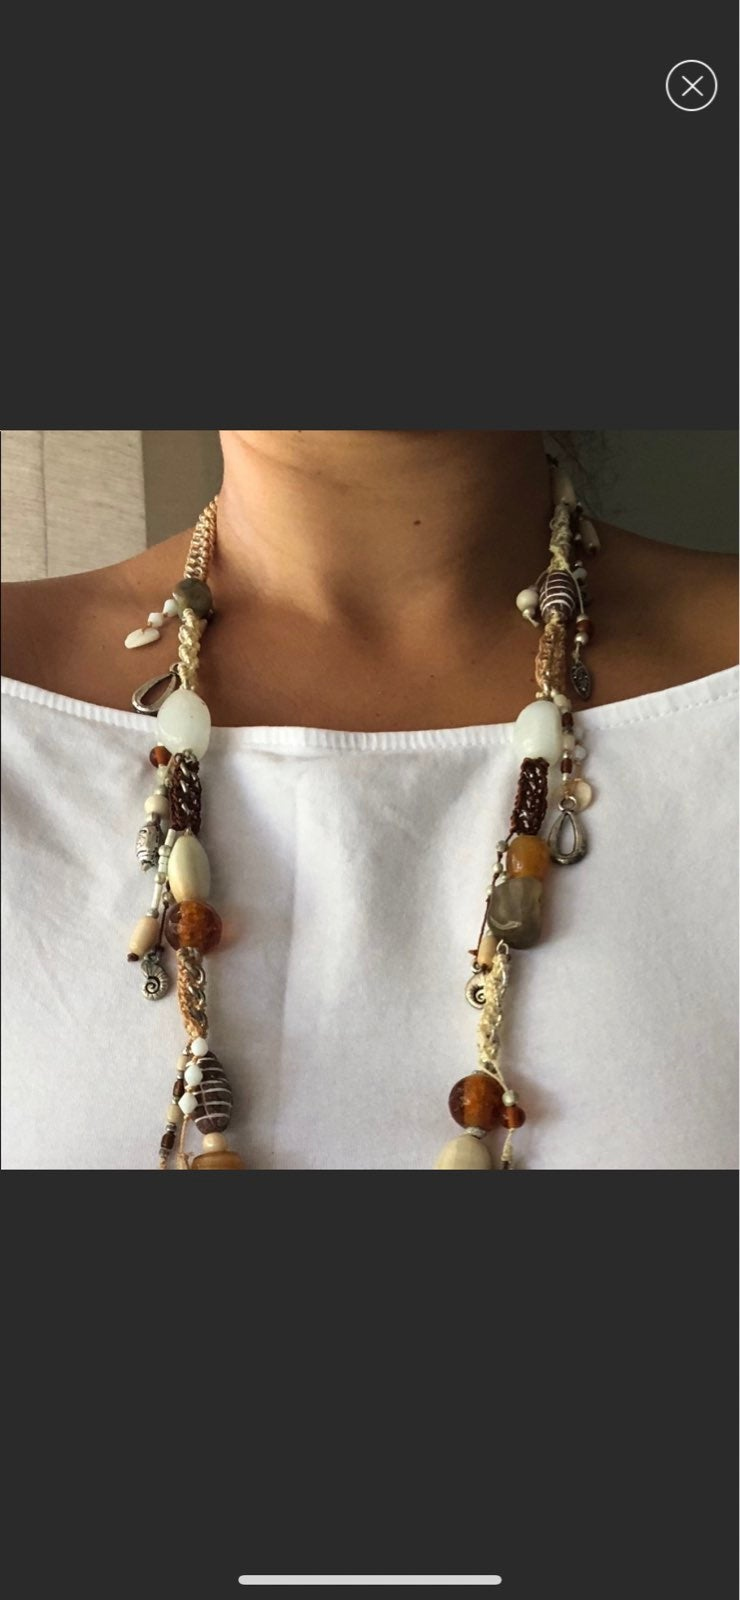 Macrame Bead and Chain Coastal Vibe Neck